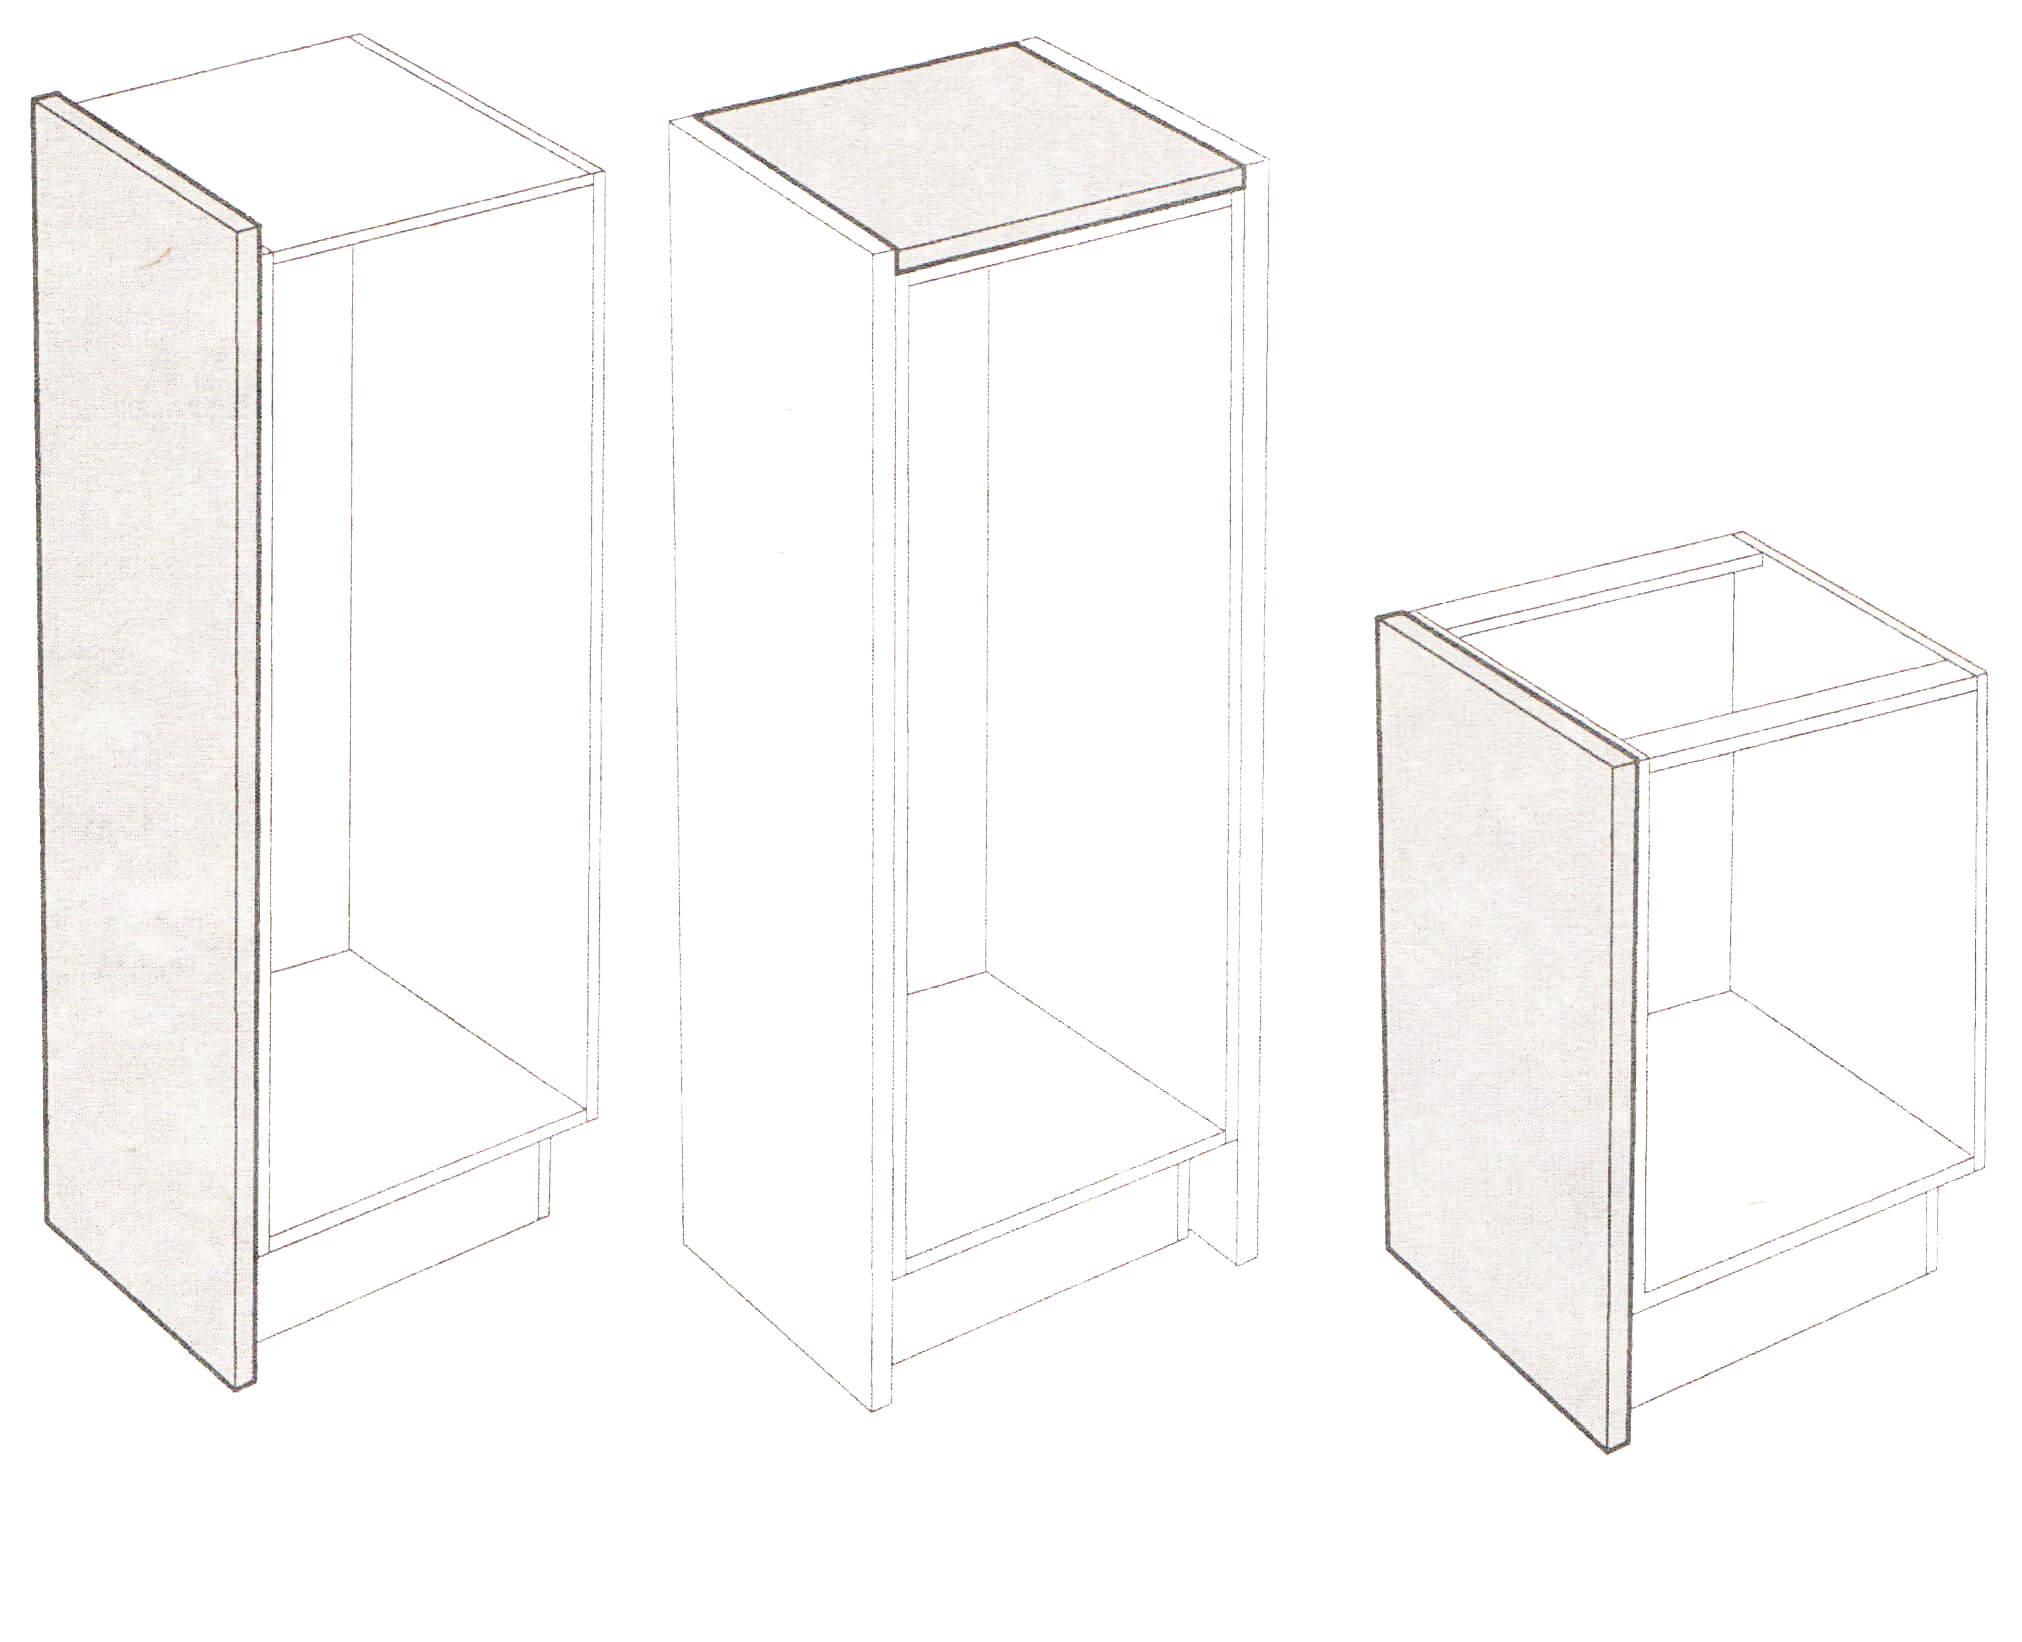 ikea perfekt deckseite tresenplatte hochglanz wei 241x60x7 6cm. Black Bedroom Furniture Sets. Home Design Ideas